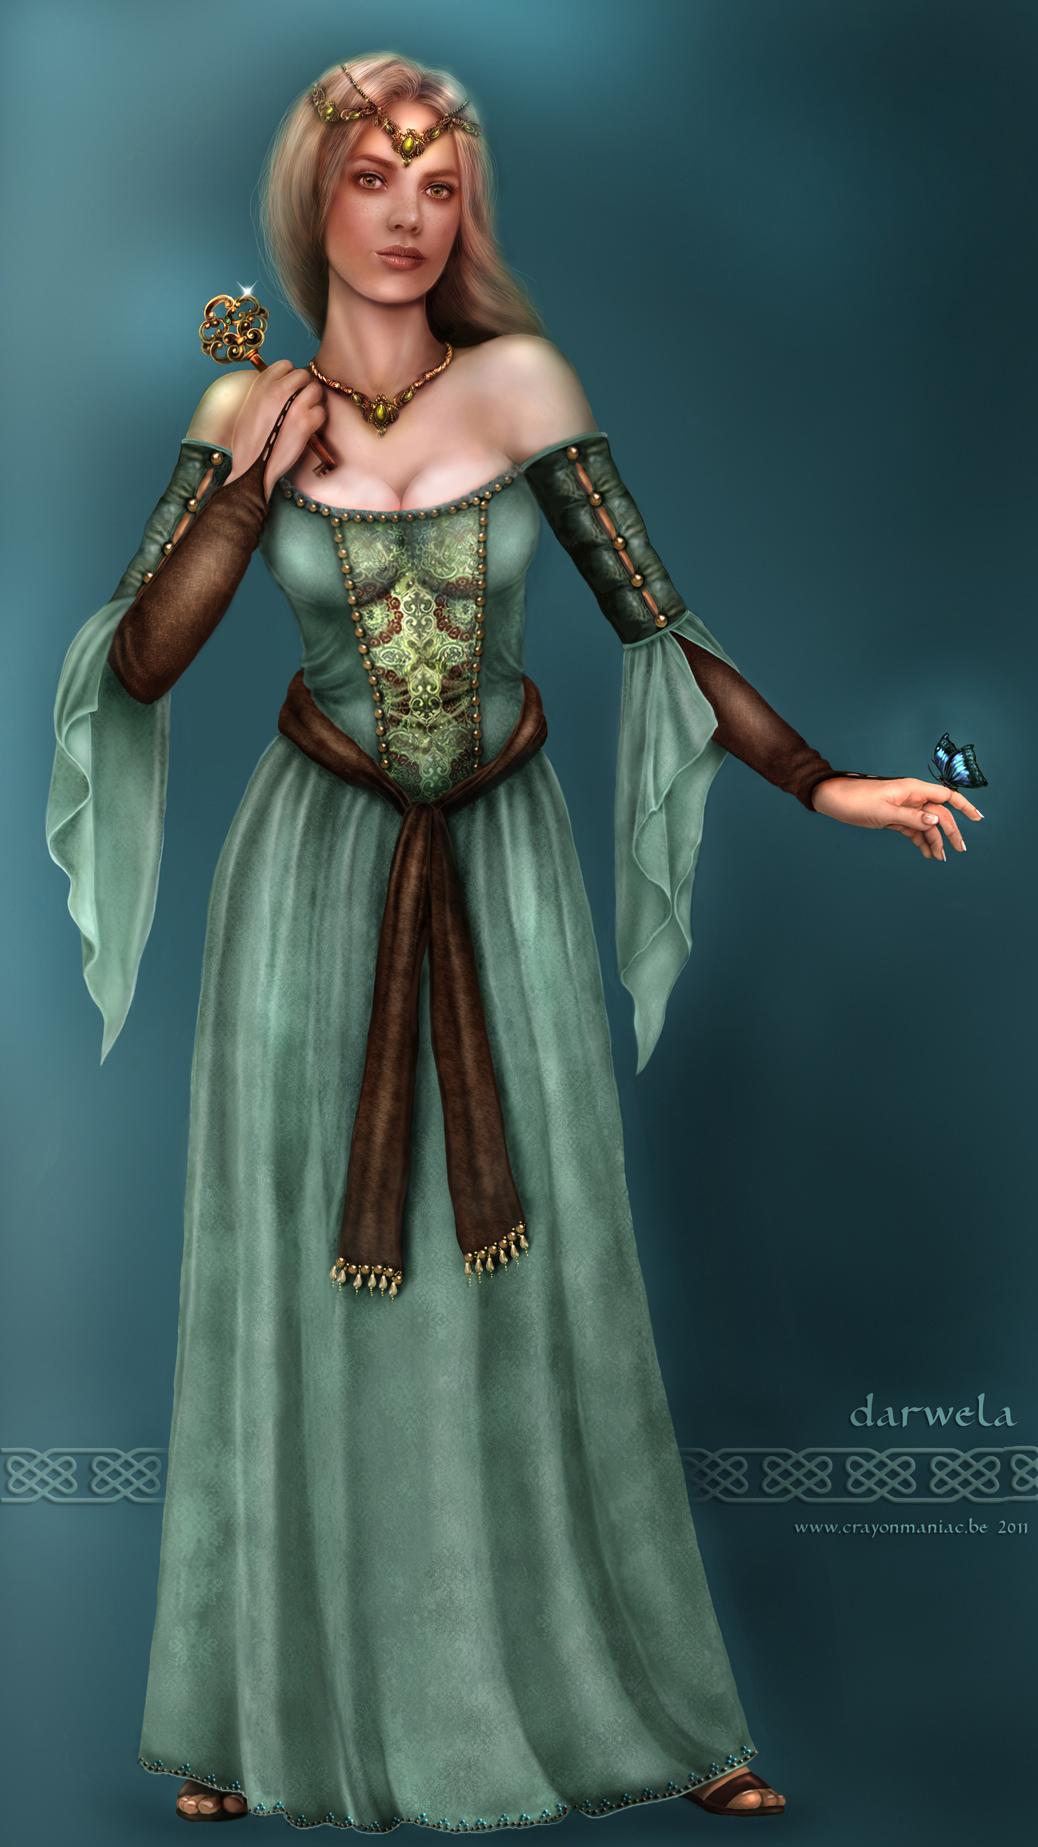 Darwela, Queen of Elves by crayonmaniac